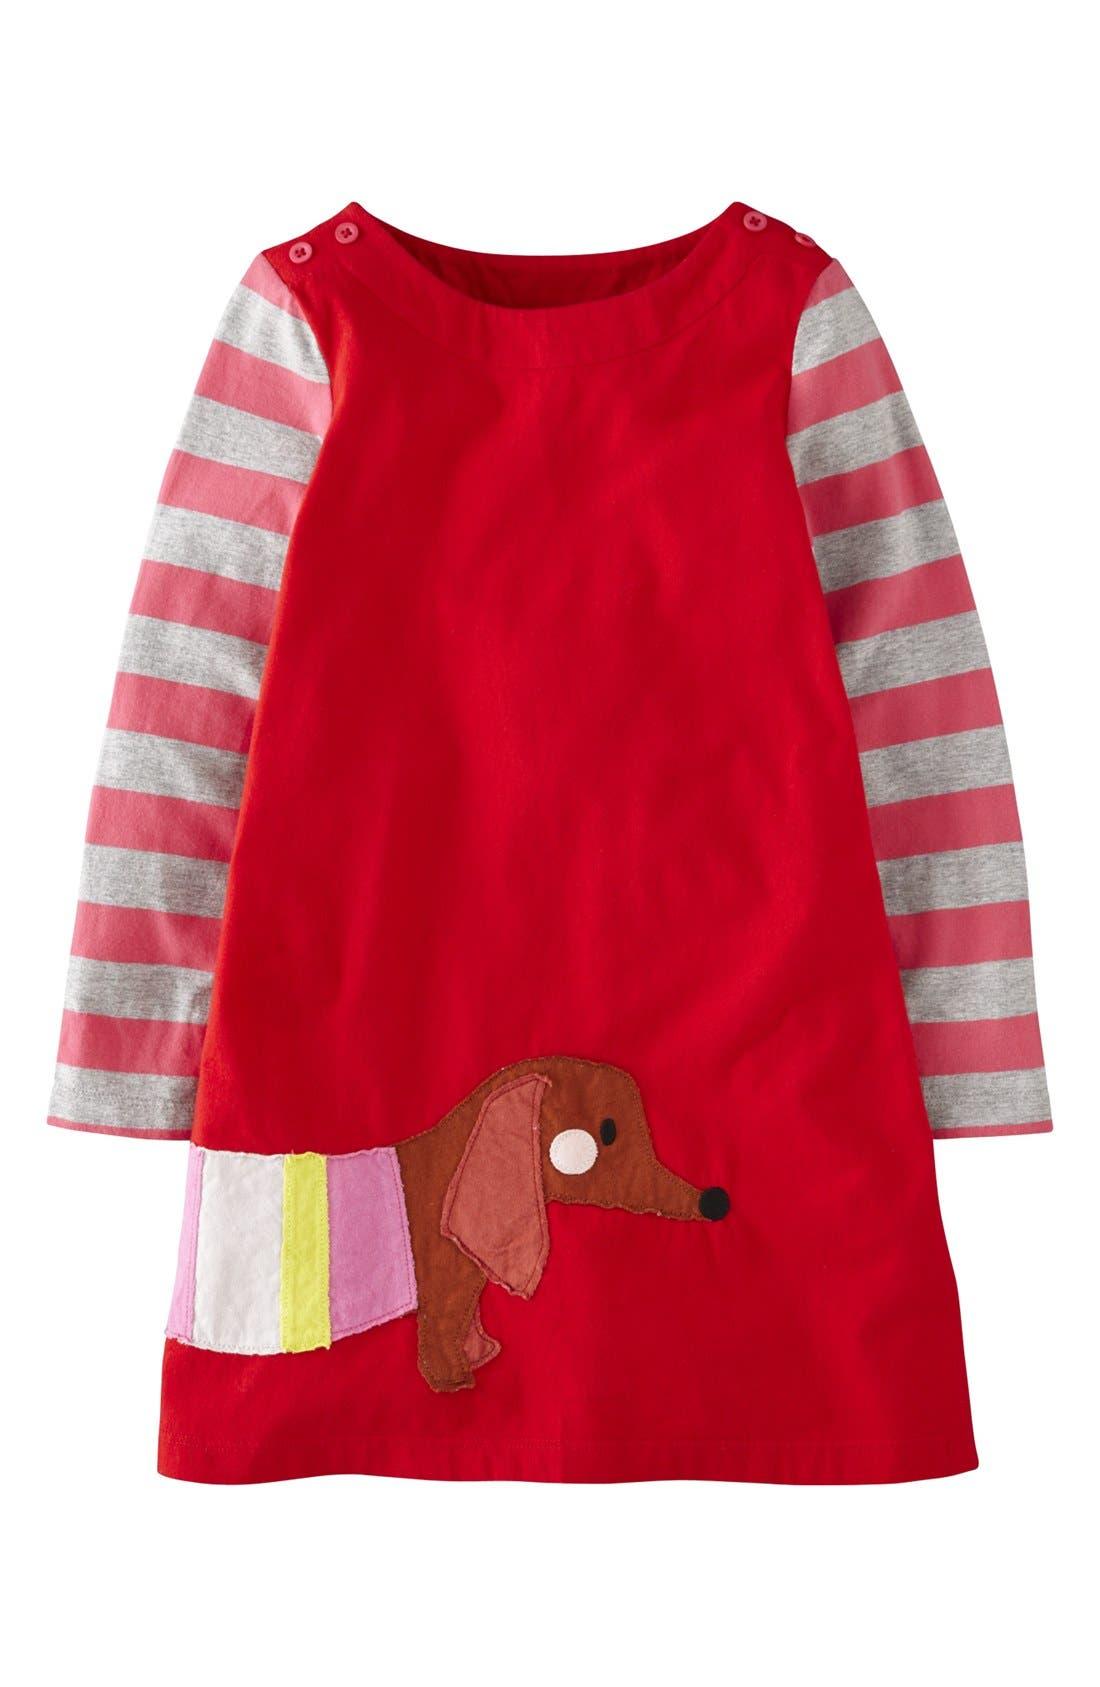 Main Image - Mini Boden 'Fun' Appliqué Dress (Toddler Girls, Little Girls & Big Girls)